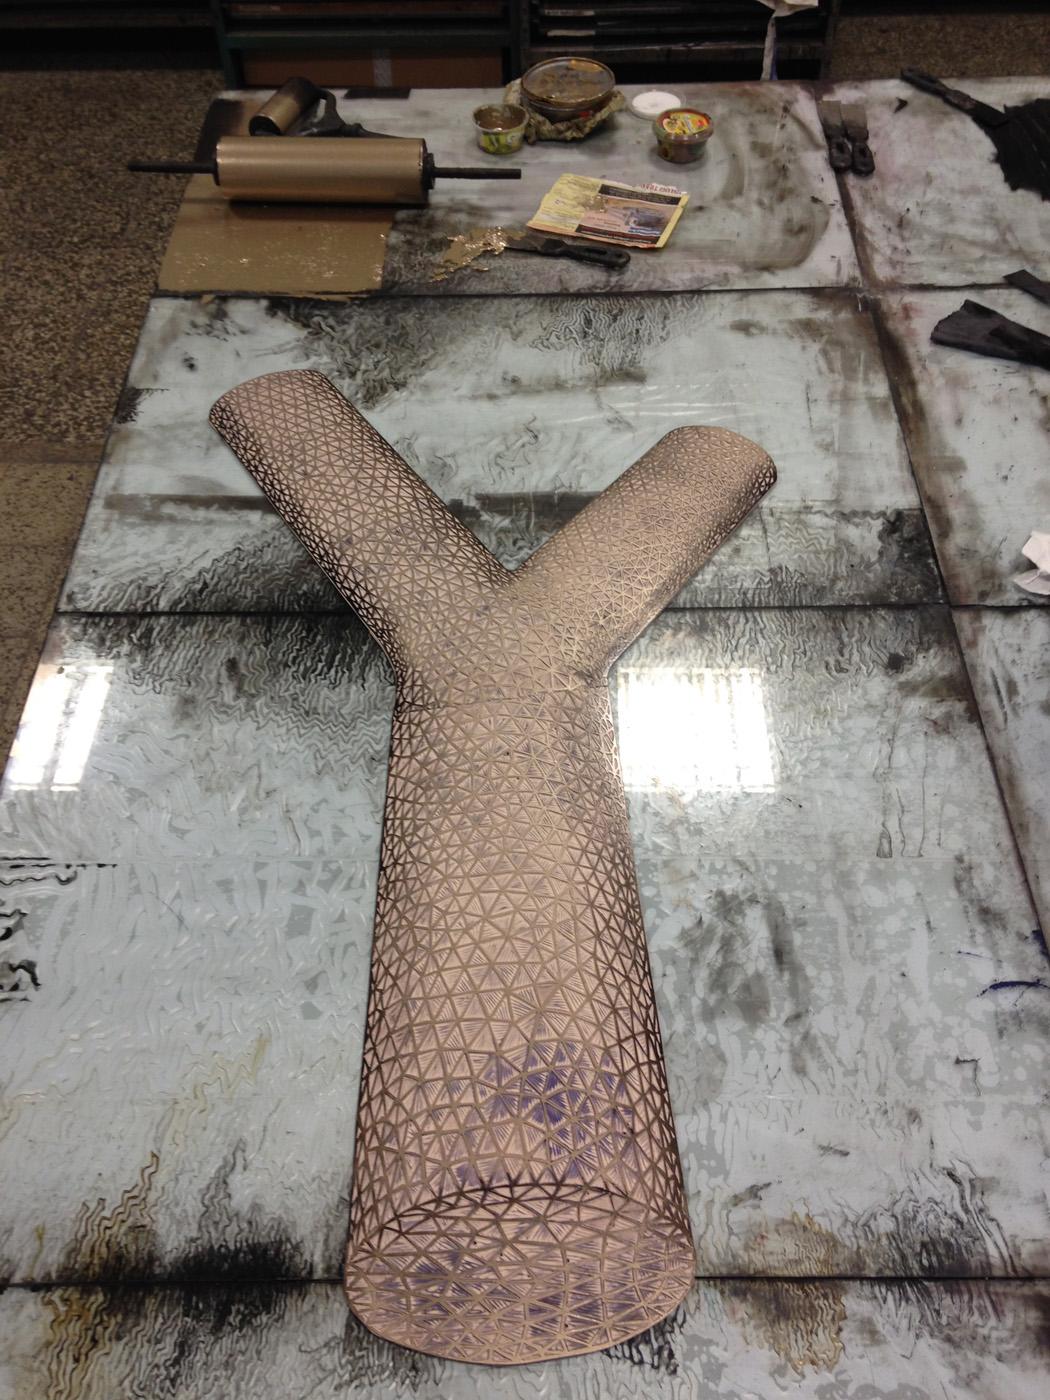 FIGURATIONS XVI linocut_printing process